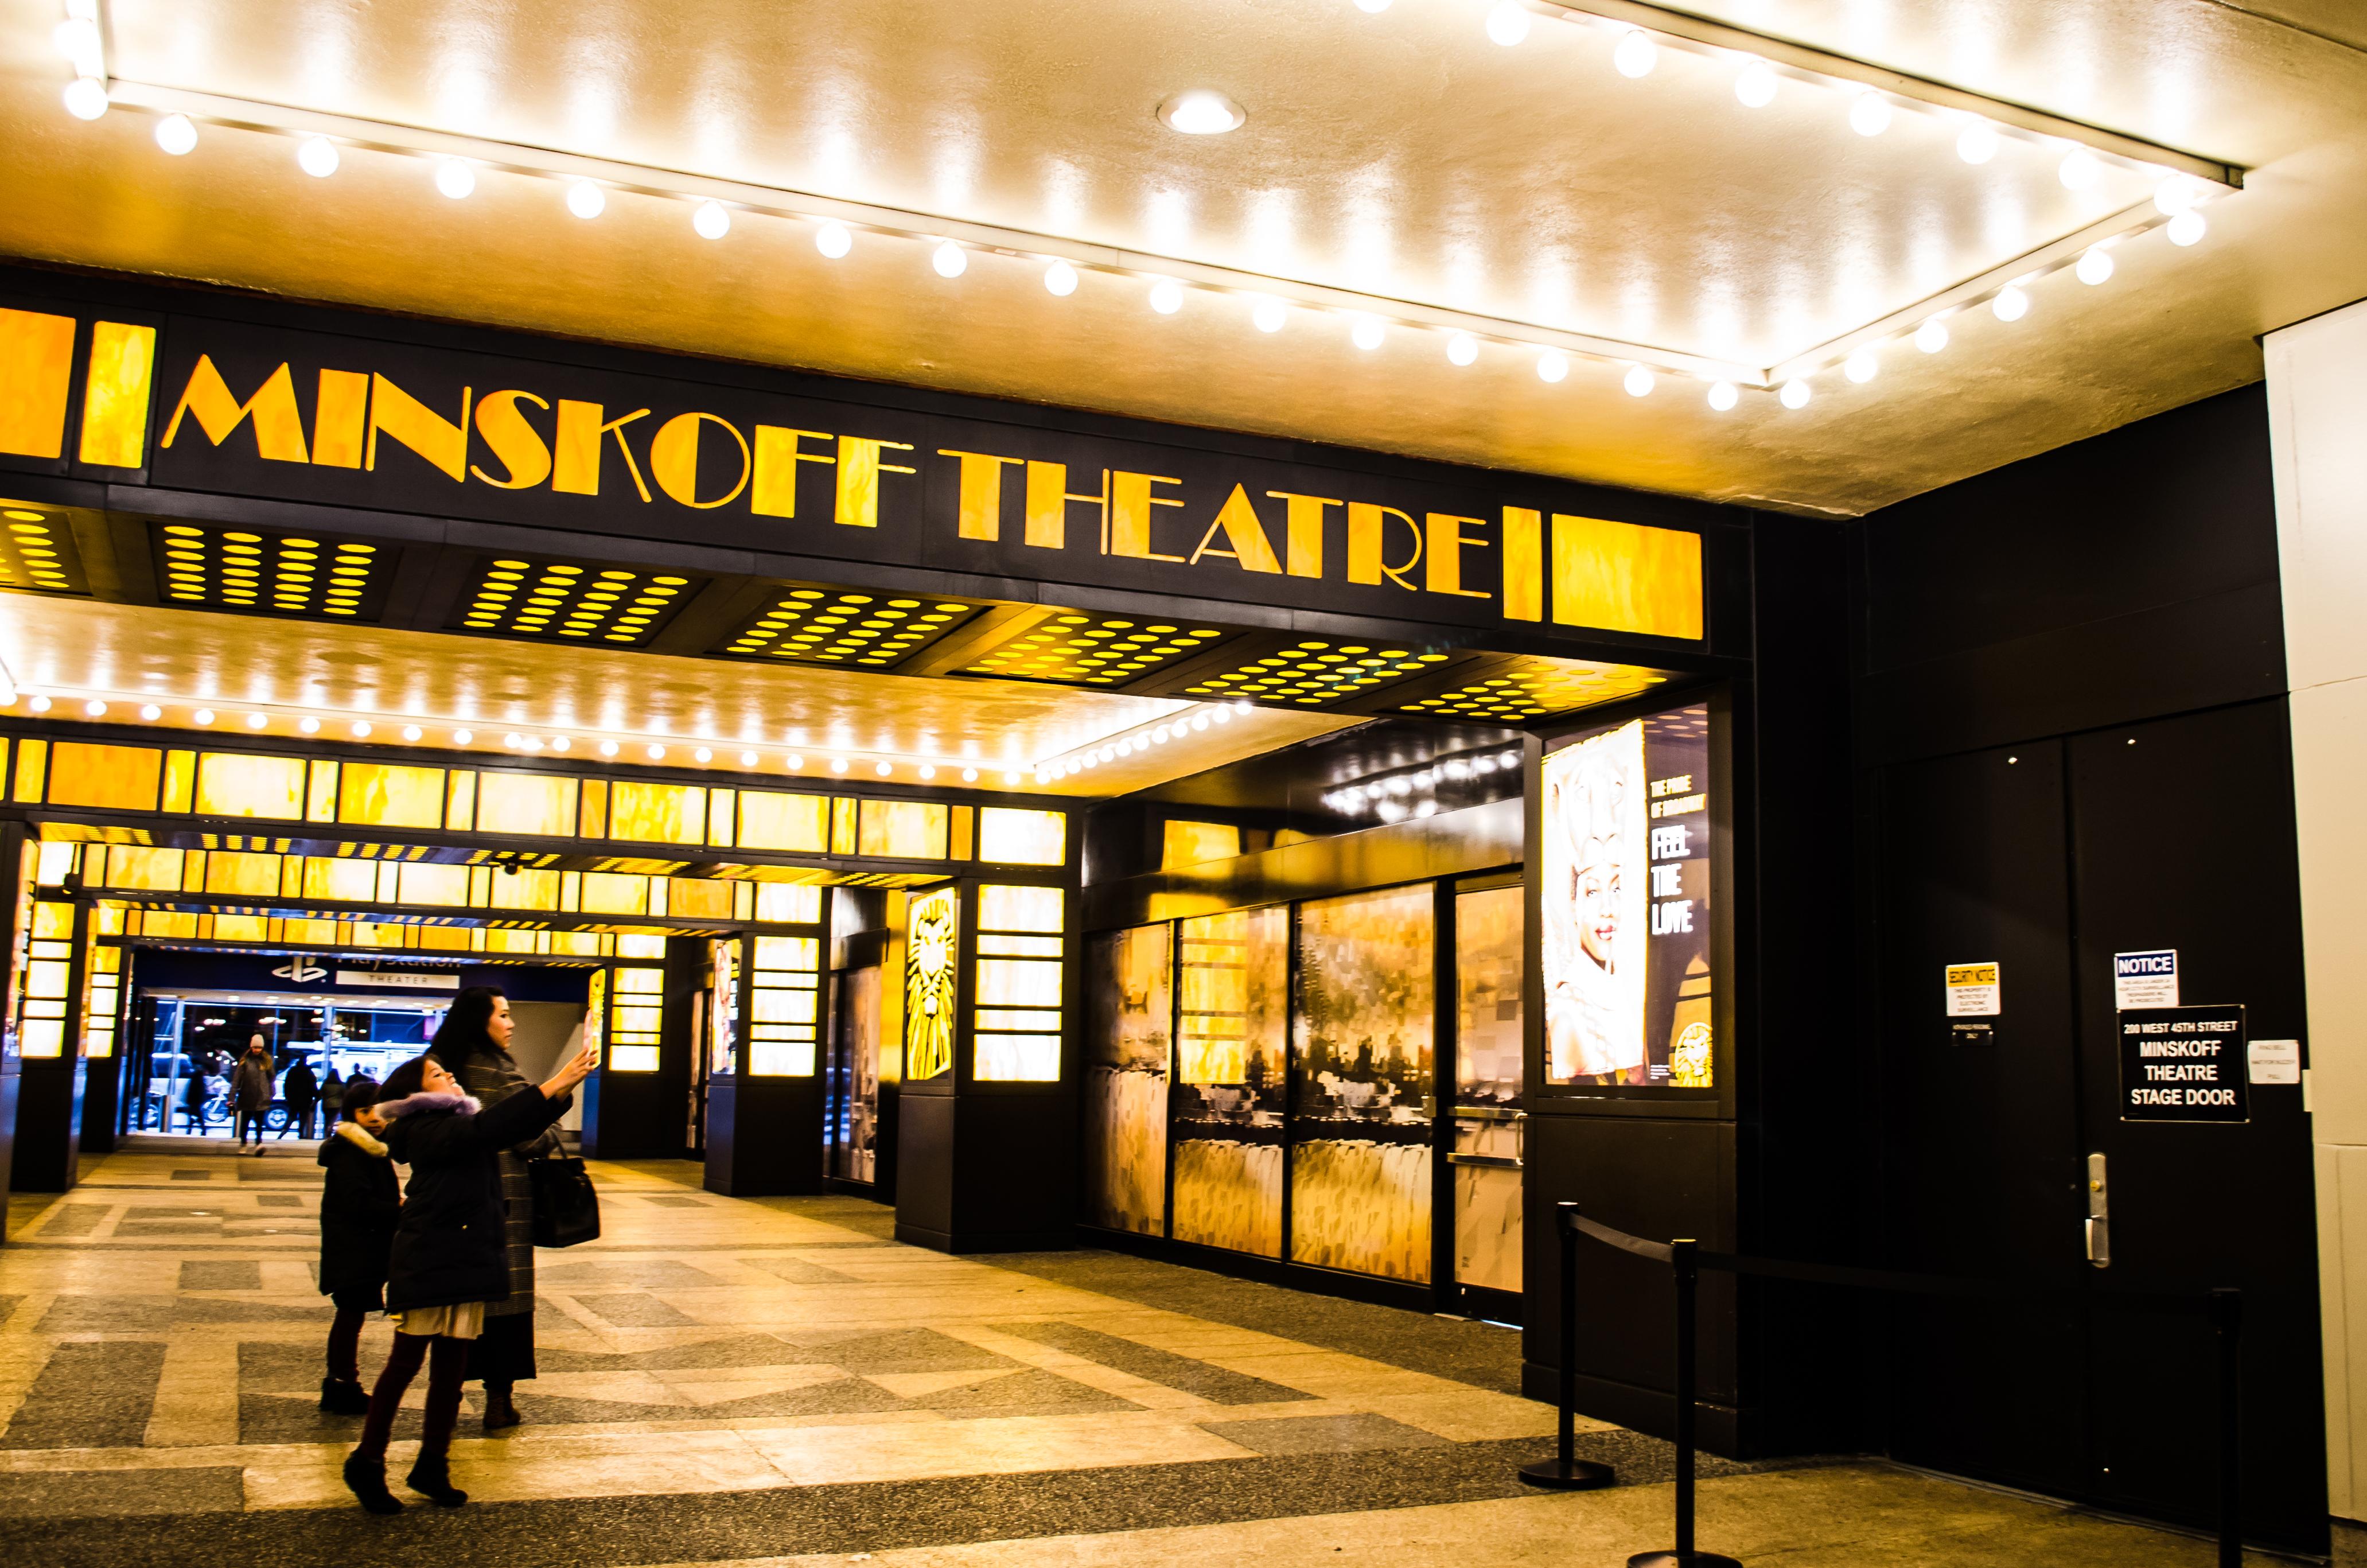 Minskoff Theatre (Broadway) - Theater Information Stage Door